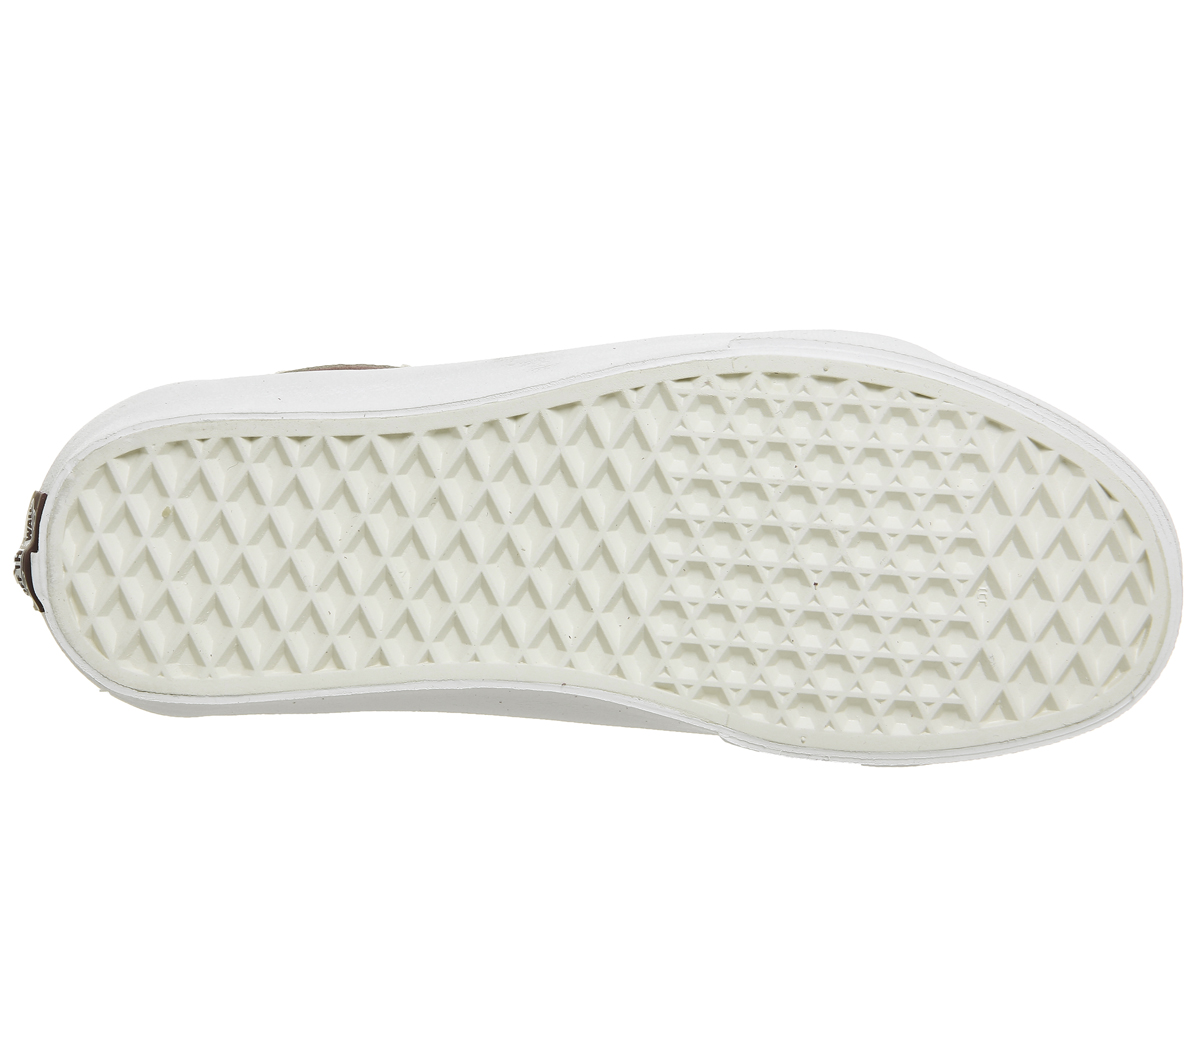 Mens Vans Sk8 Hi Trainers EGGNOG PORT EGGNOG Trainers TRUE WHITE EXCLUSIVE Trainers Shoes 6aebaa